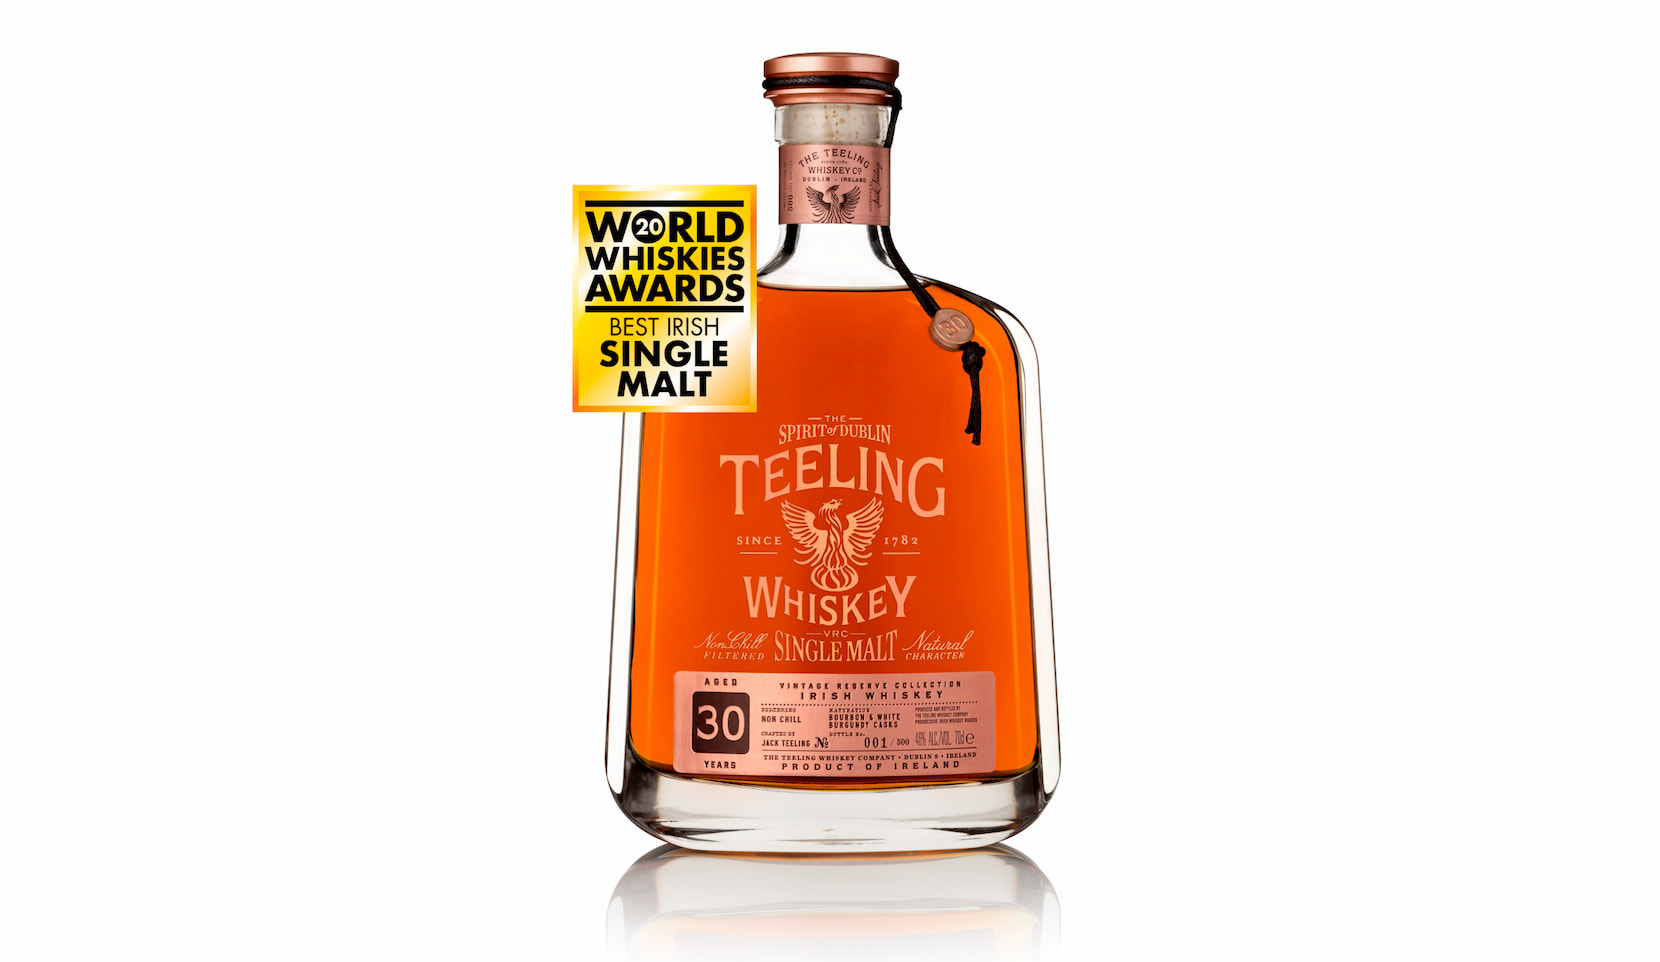 Teeling Whiskey Continues World's Best Winning Streak